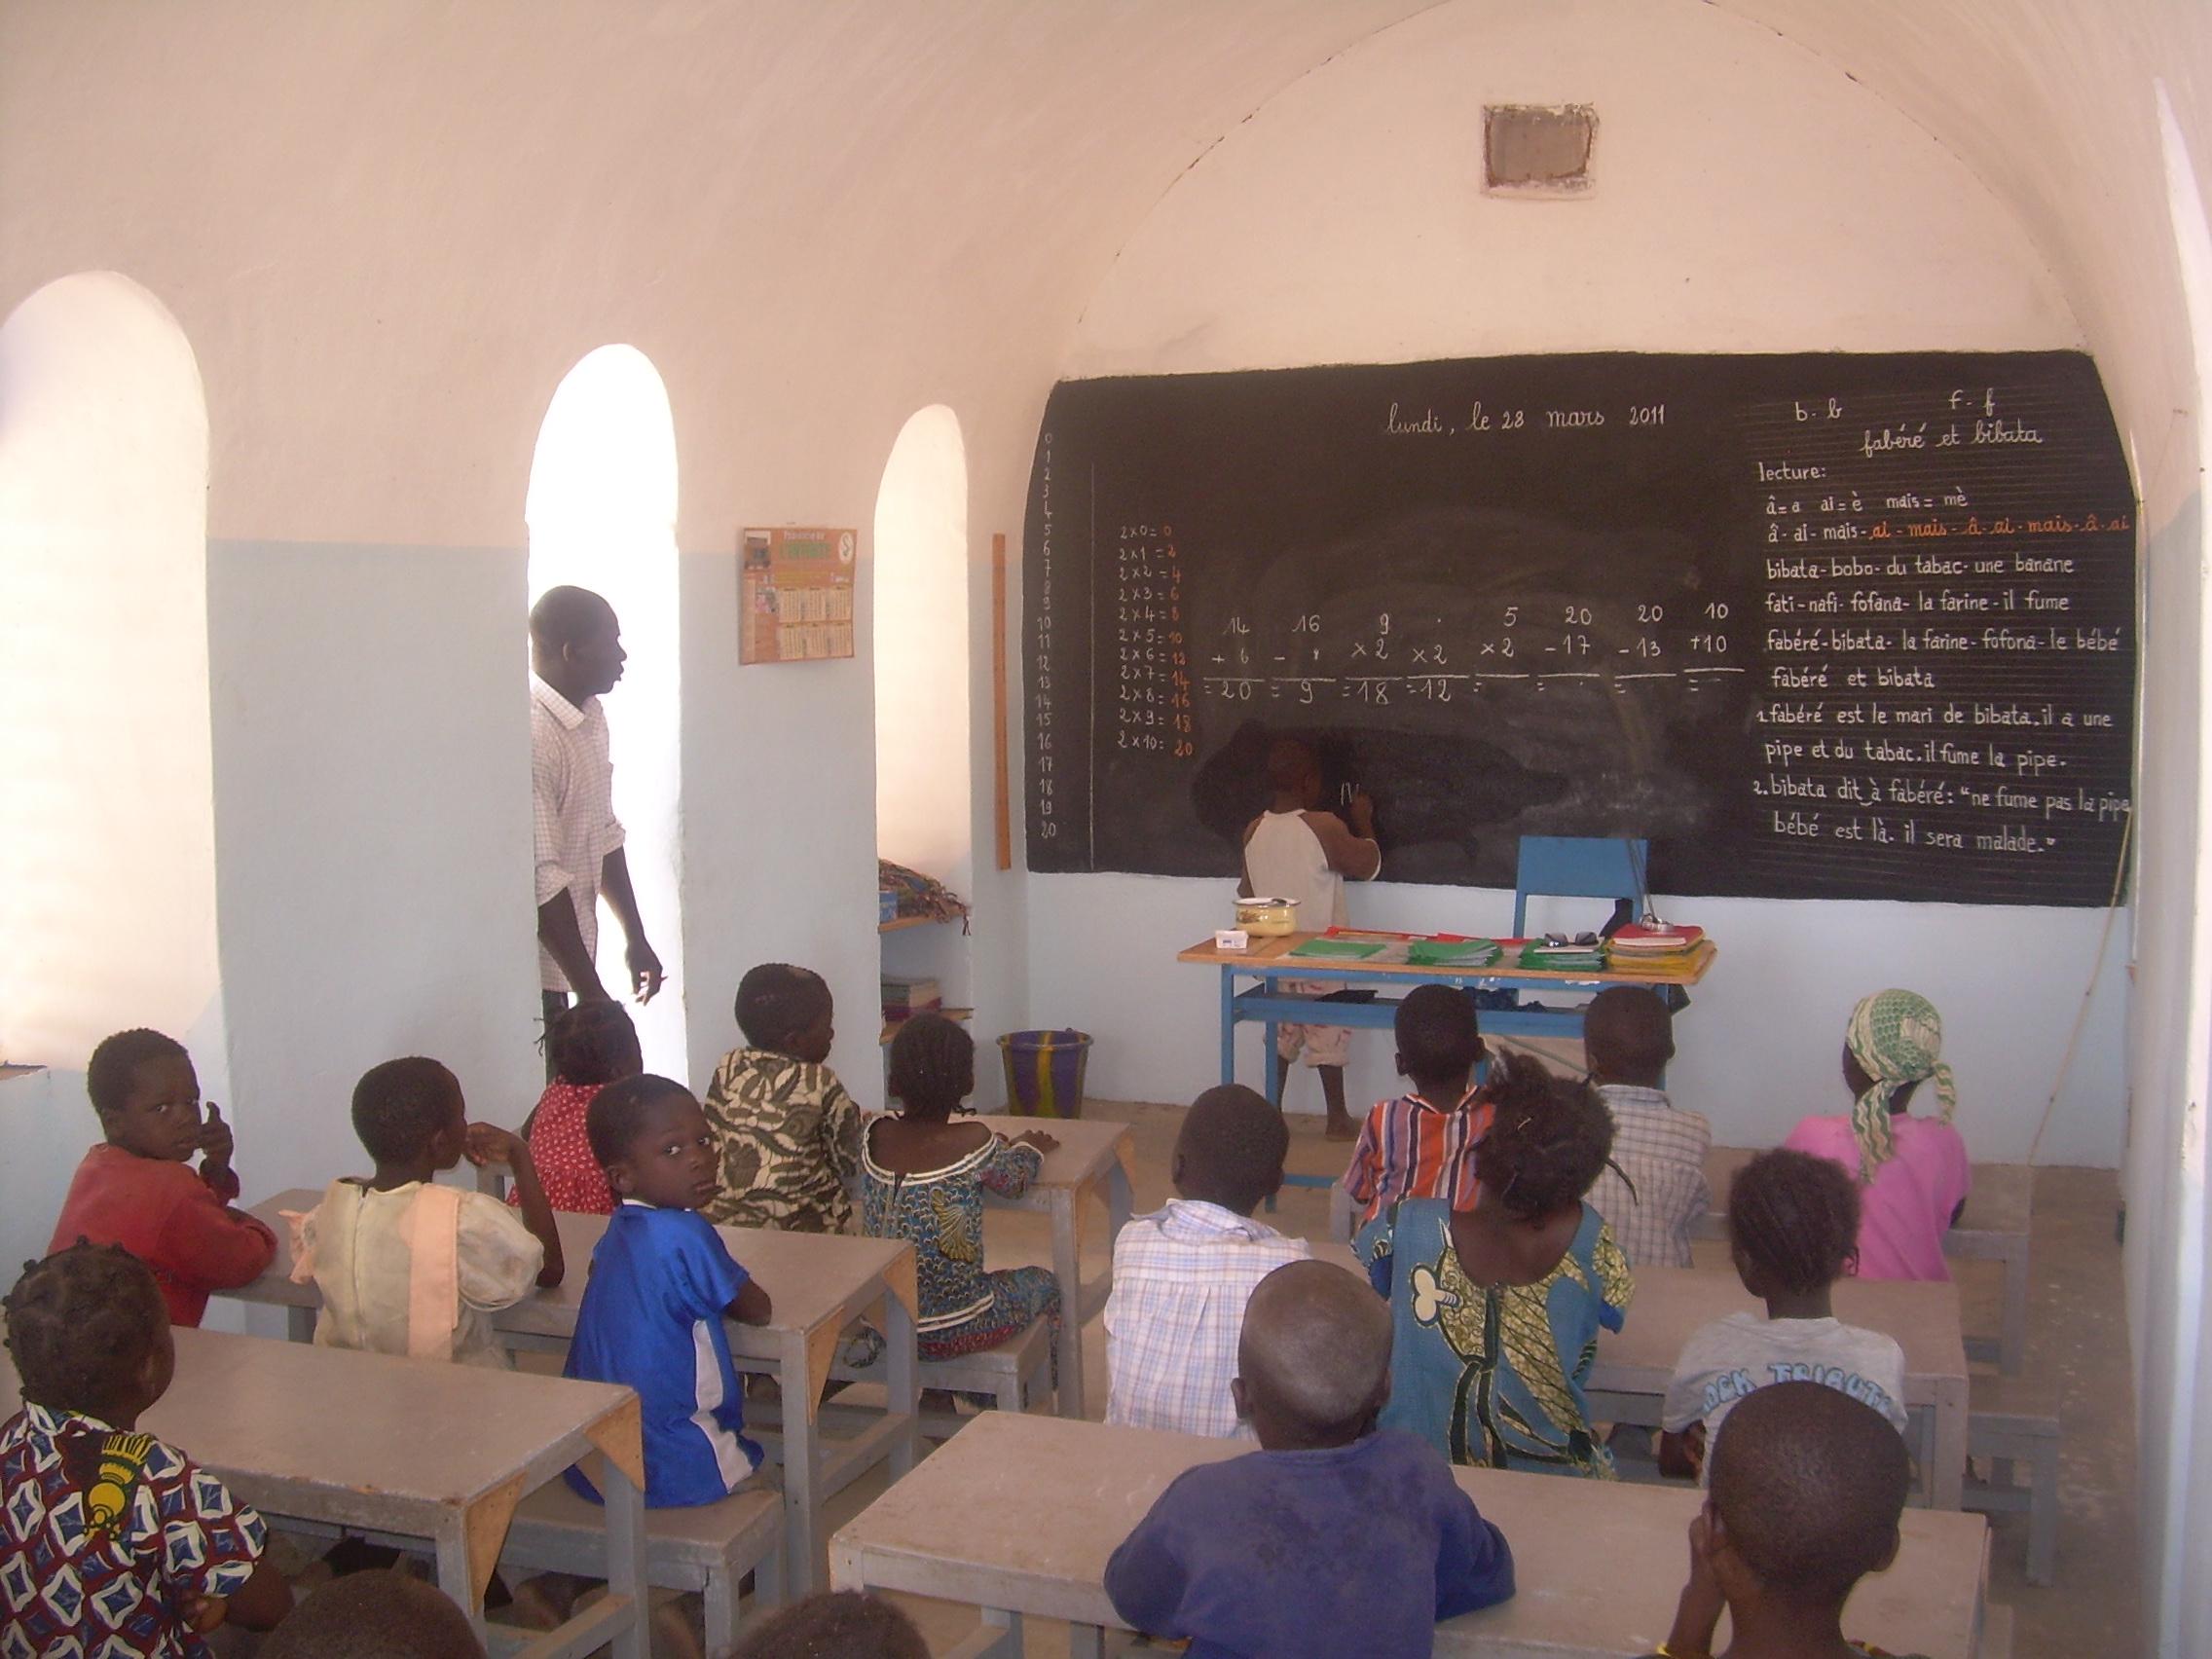 School_-_Earth_Roofs_in_the_Sahel_Program.jpg